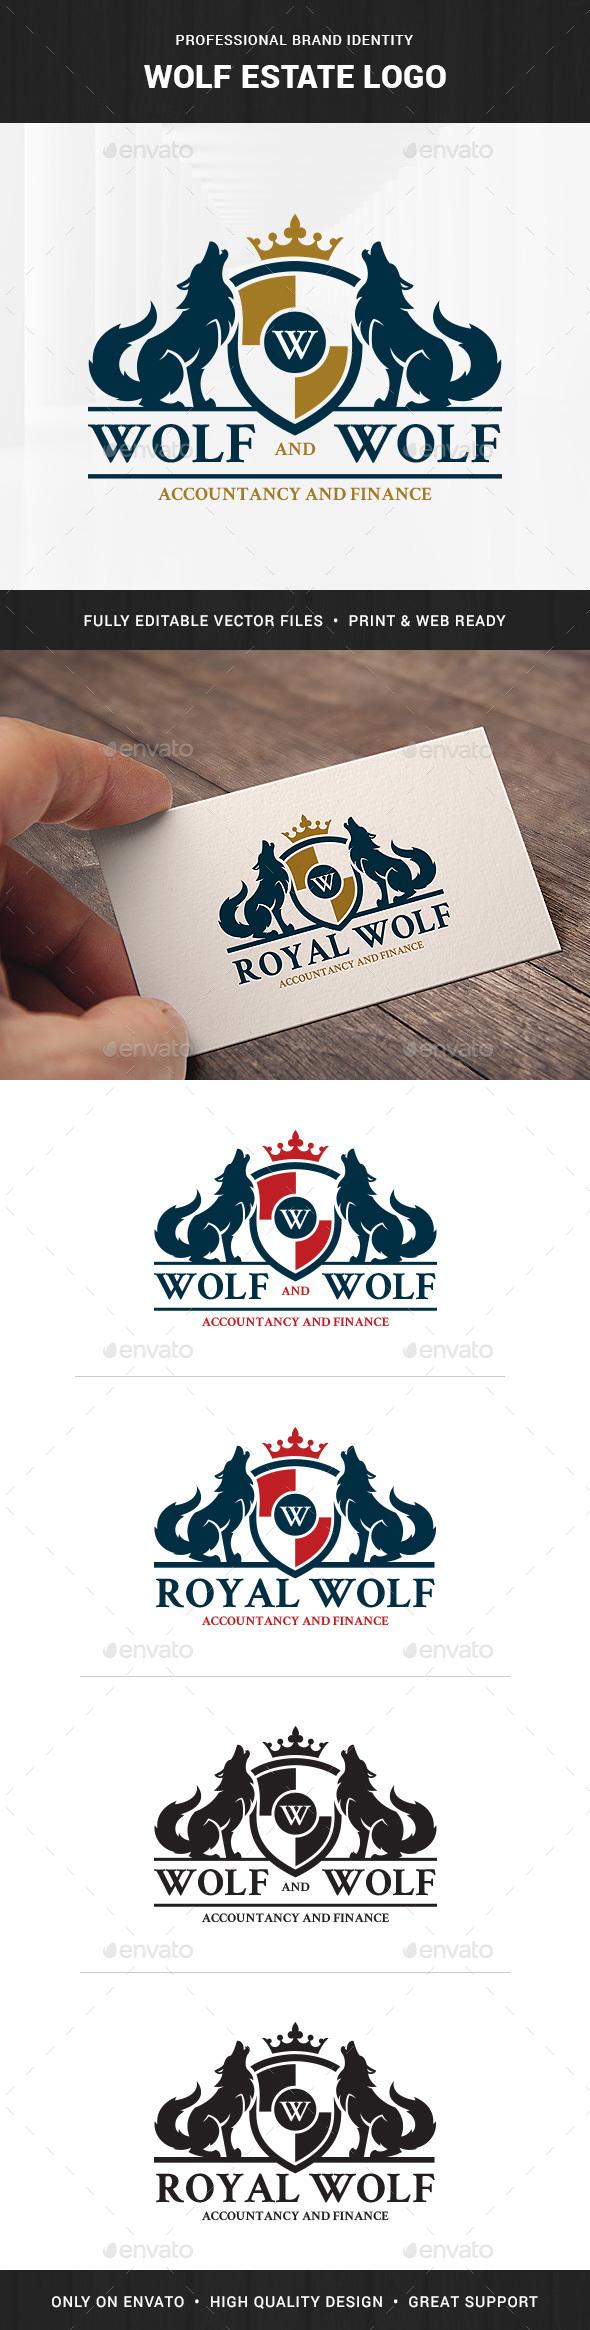 Wolf Estate Logo Template